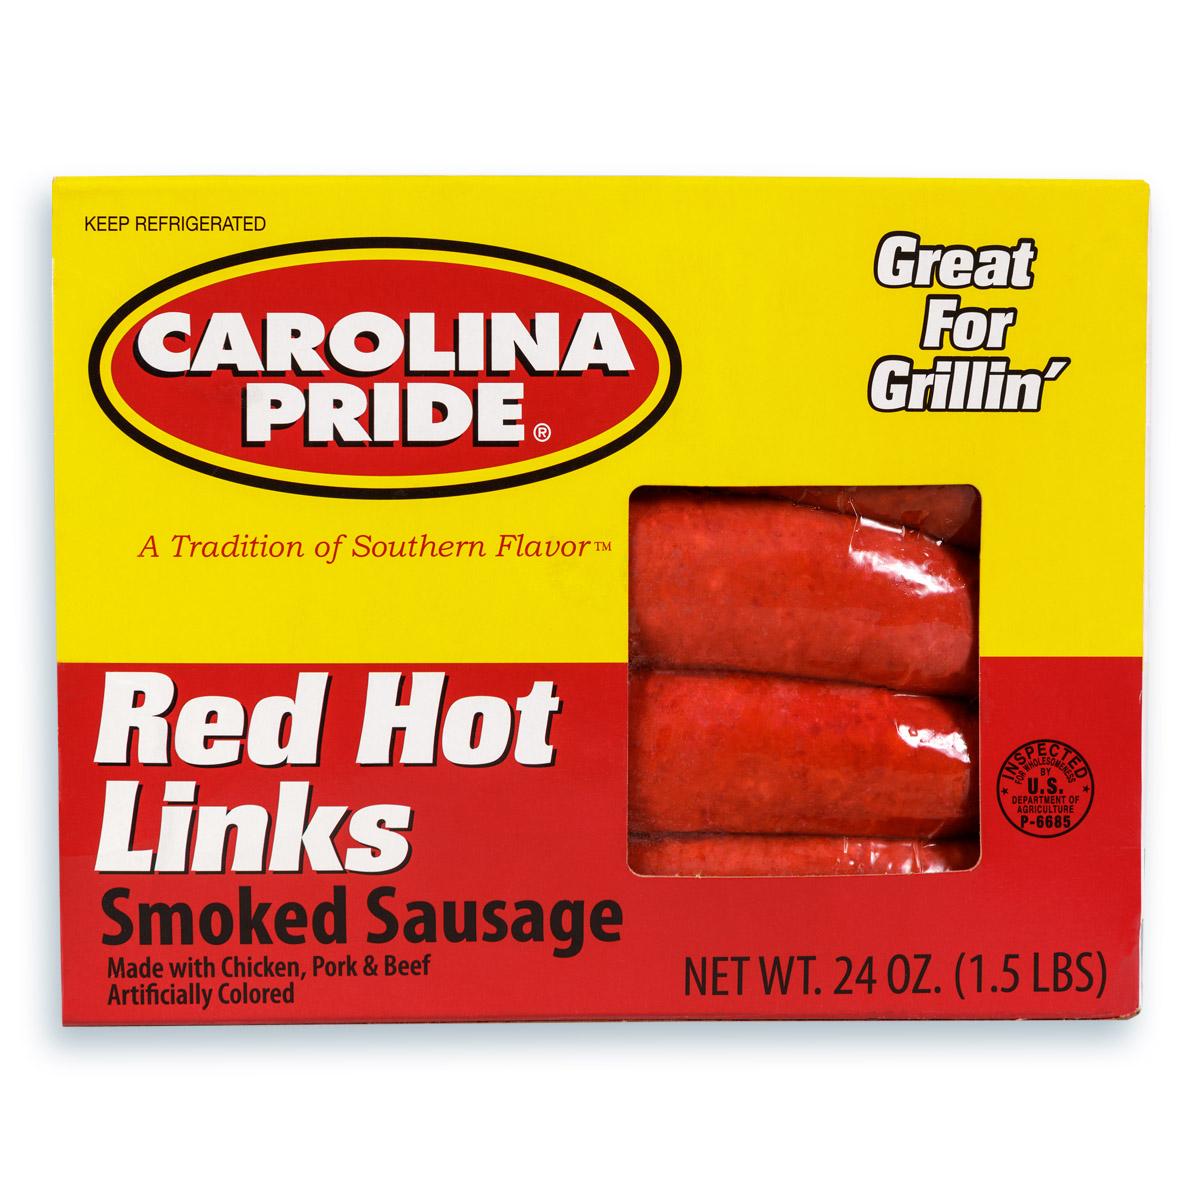 Red Hot Links Smoked Sausage – 3627